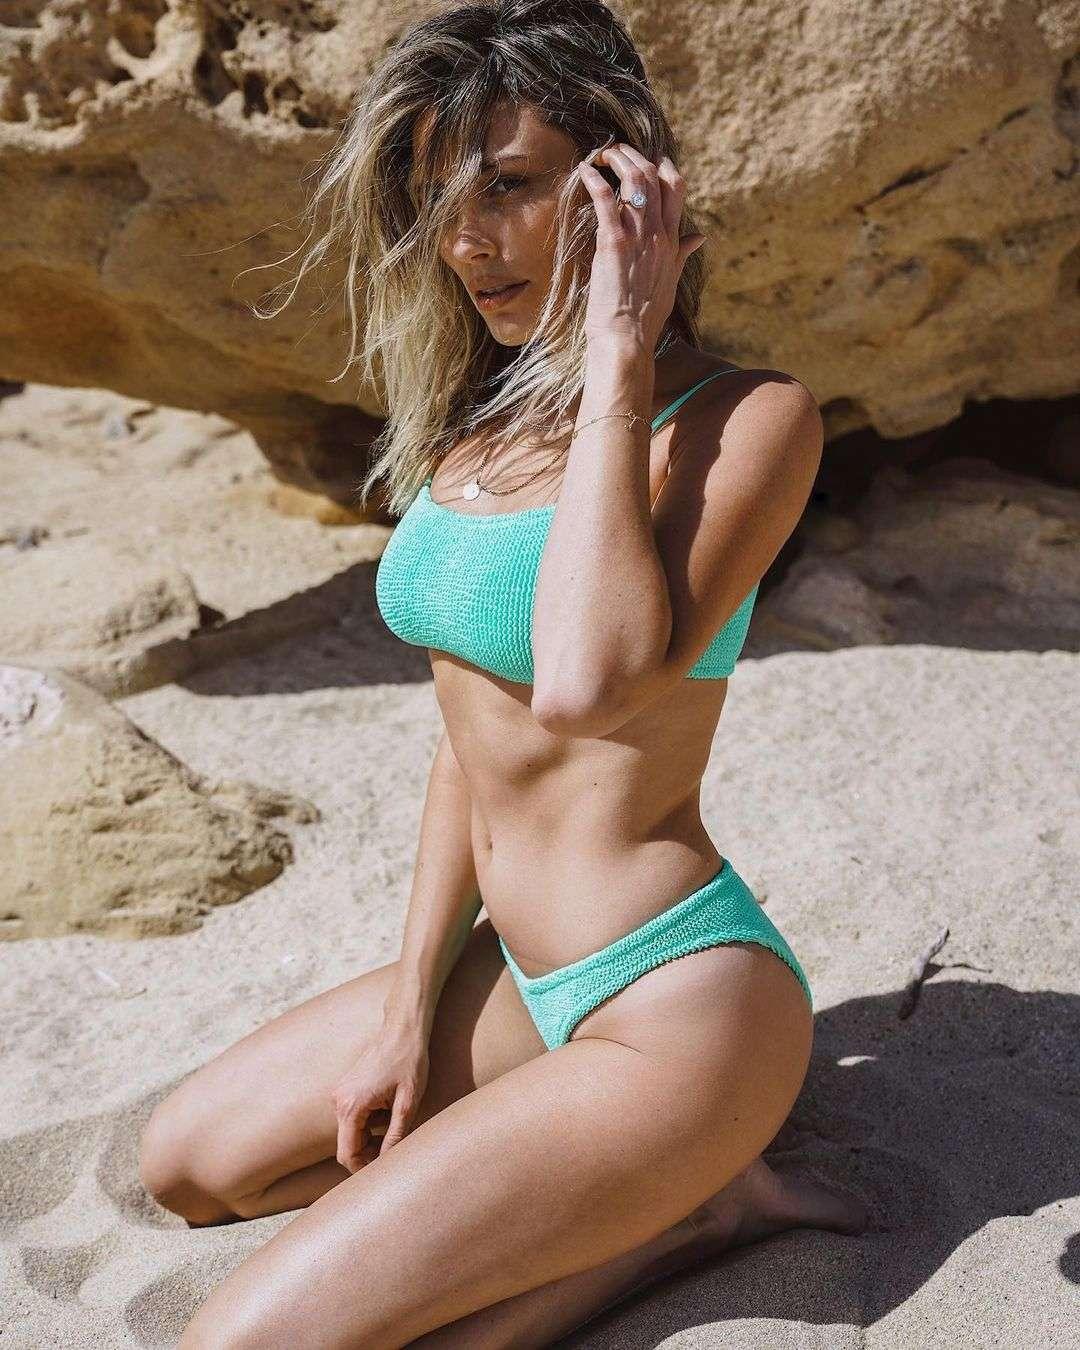 Arielle Vandenberg hot pics